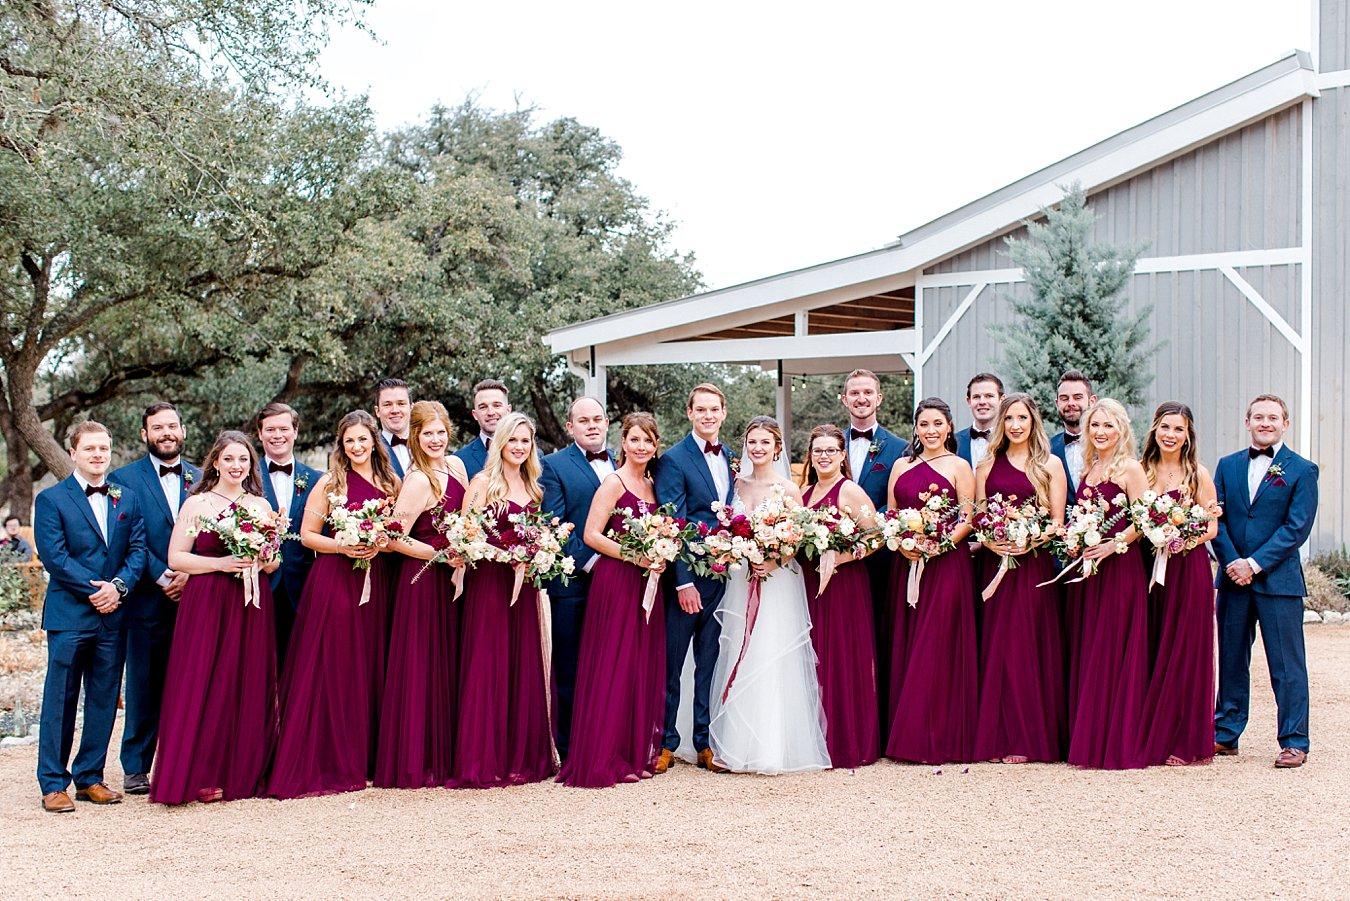 Addison-Grove-Wedding-Photos-Dripping-Springs-TX-5133.jpg